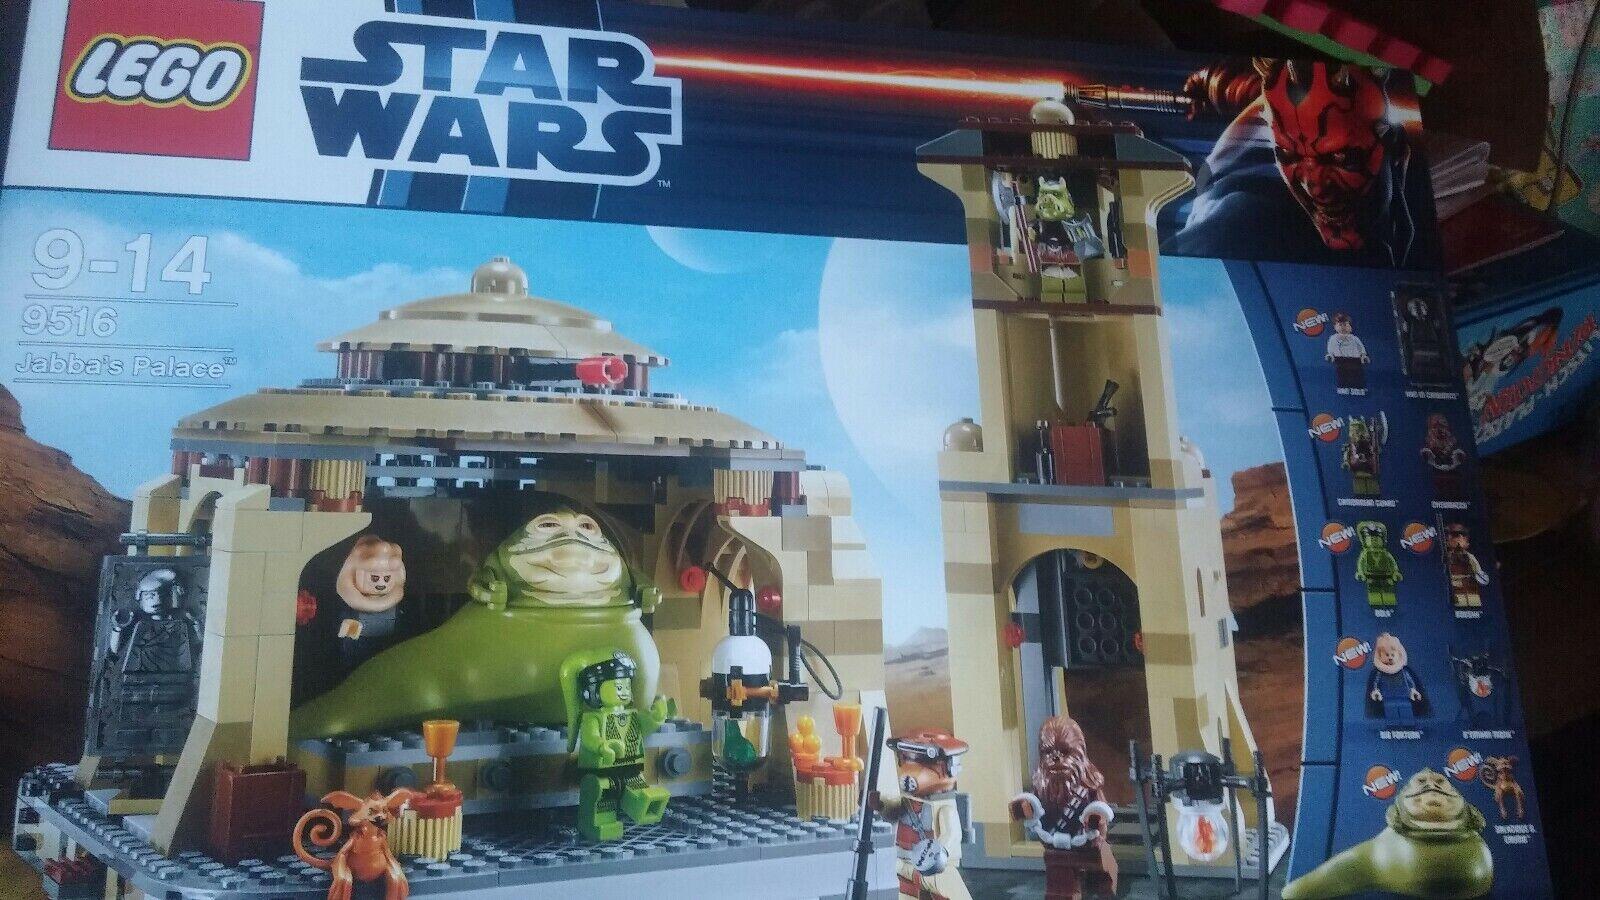 Lego Star Wars 9516 Jabba's Palace Neuf ET Neuf dans sa boîte